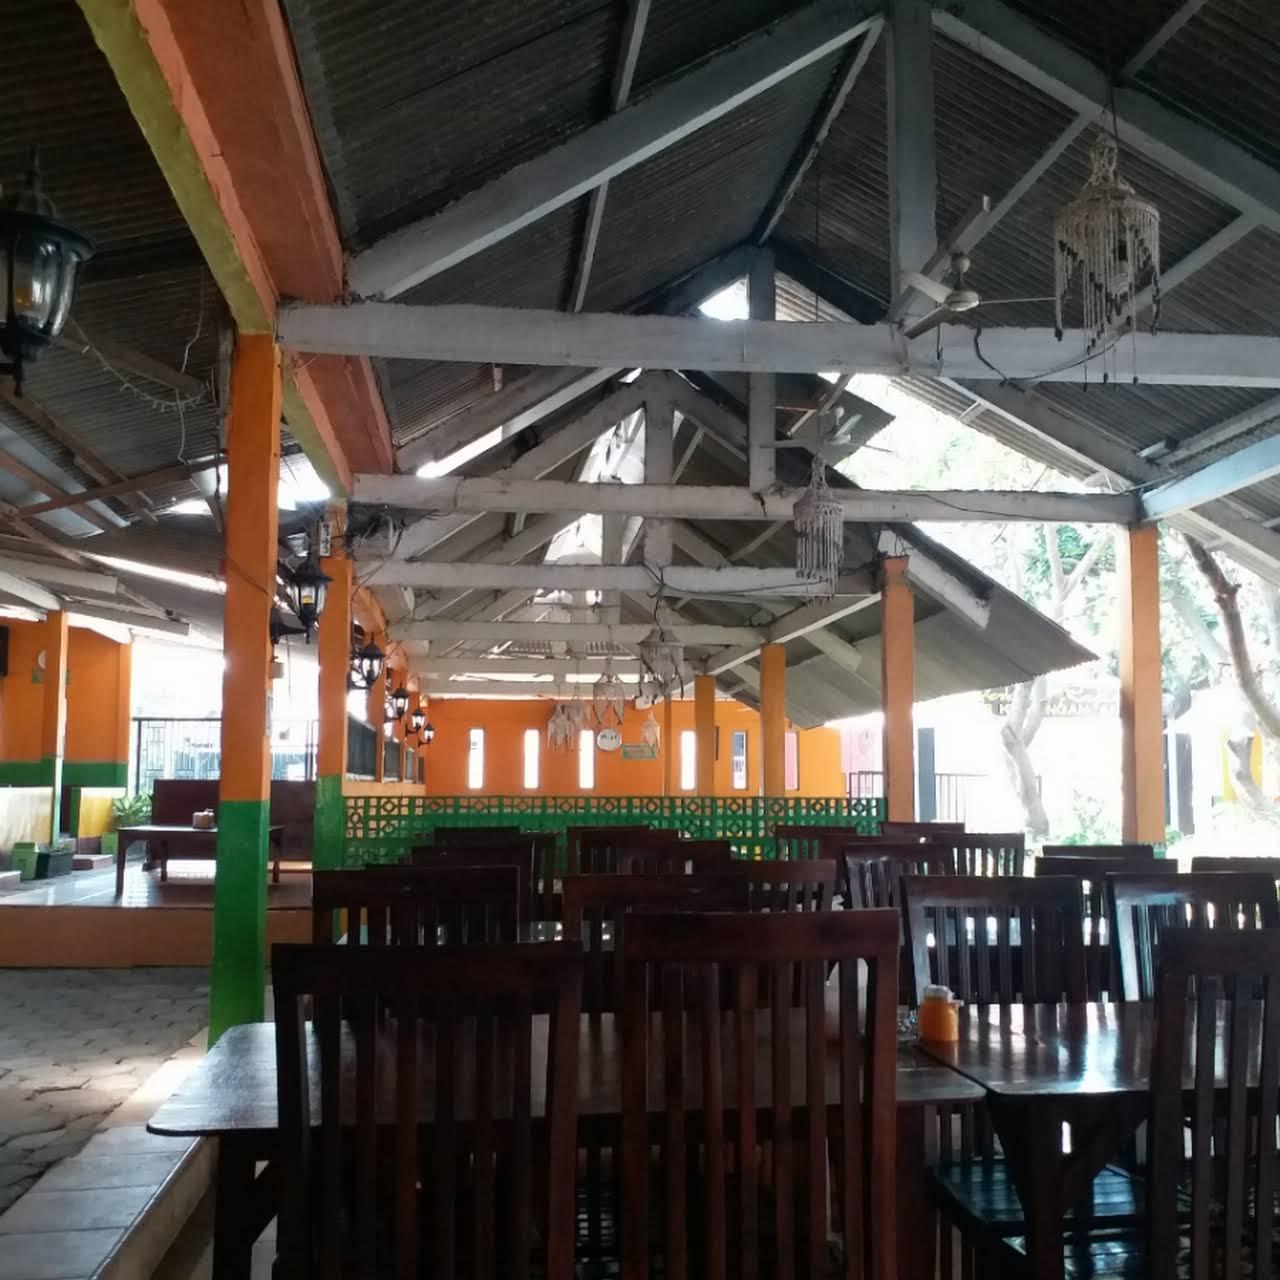 Rm Lesehan Pak Wito Restoran